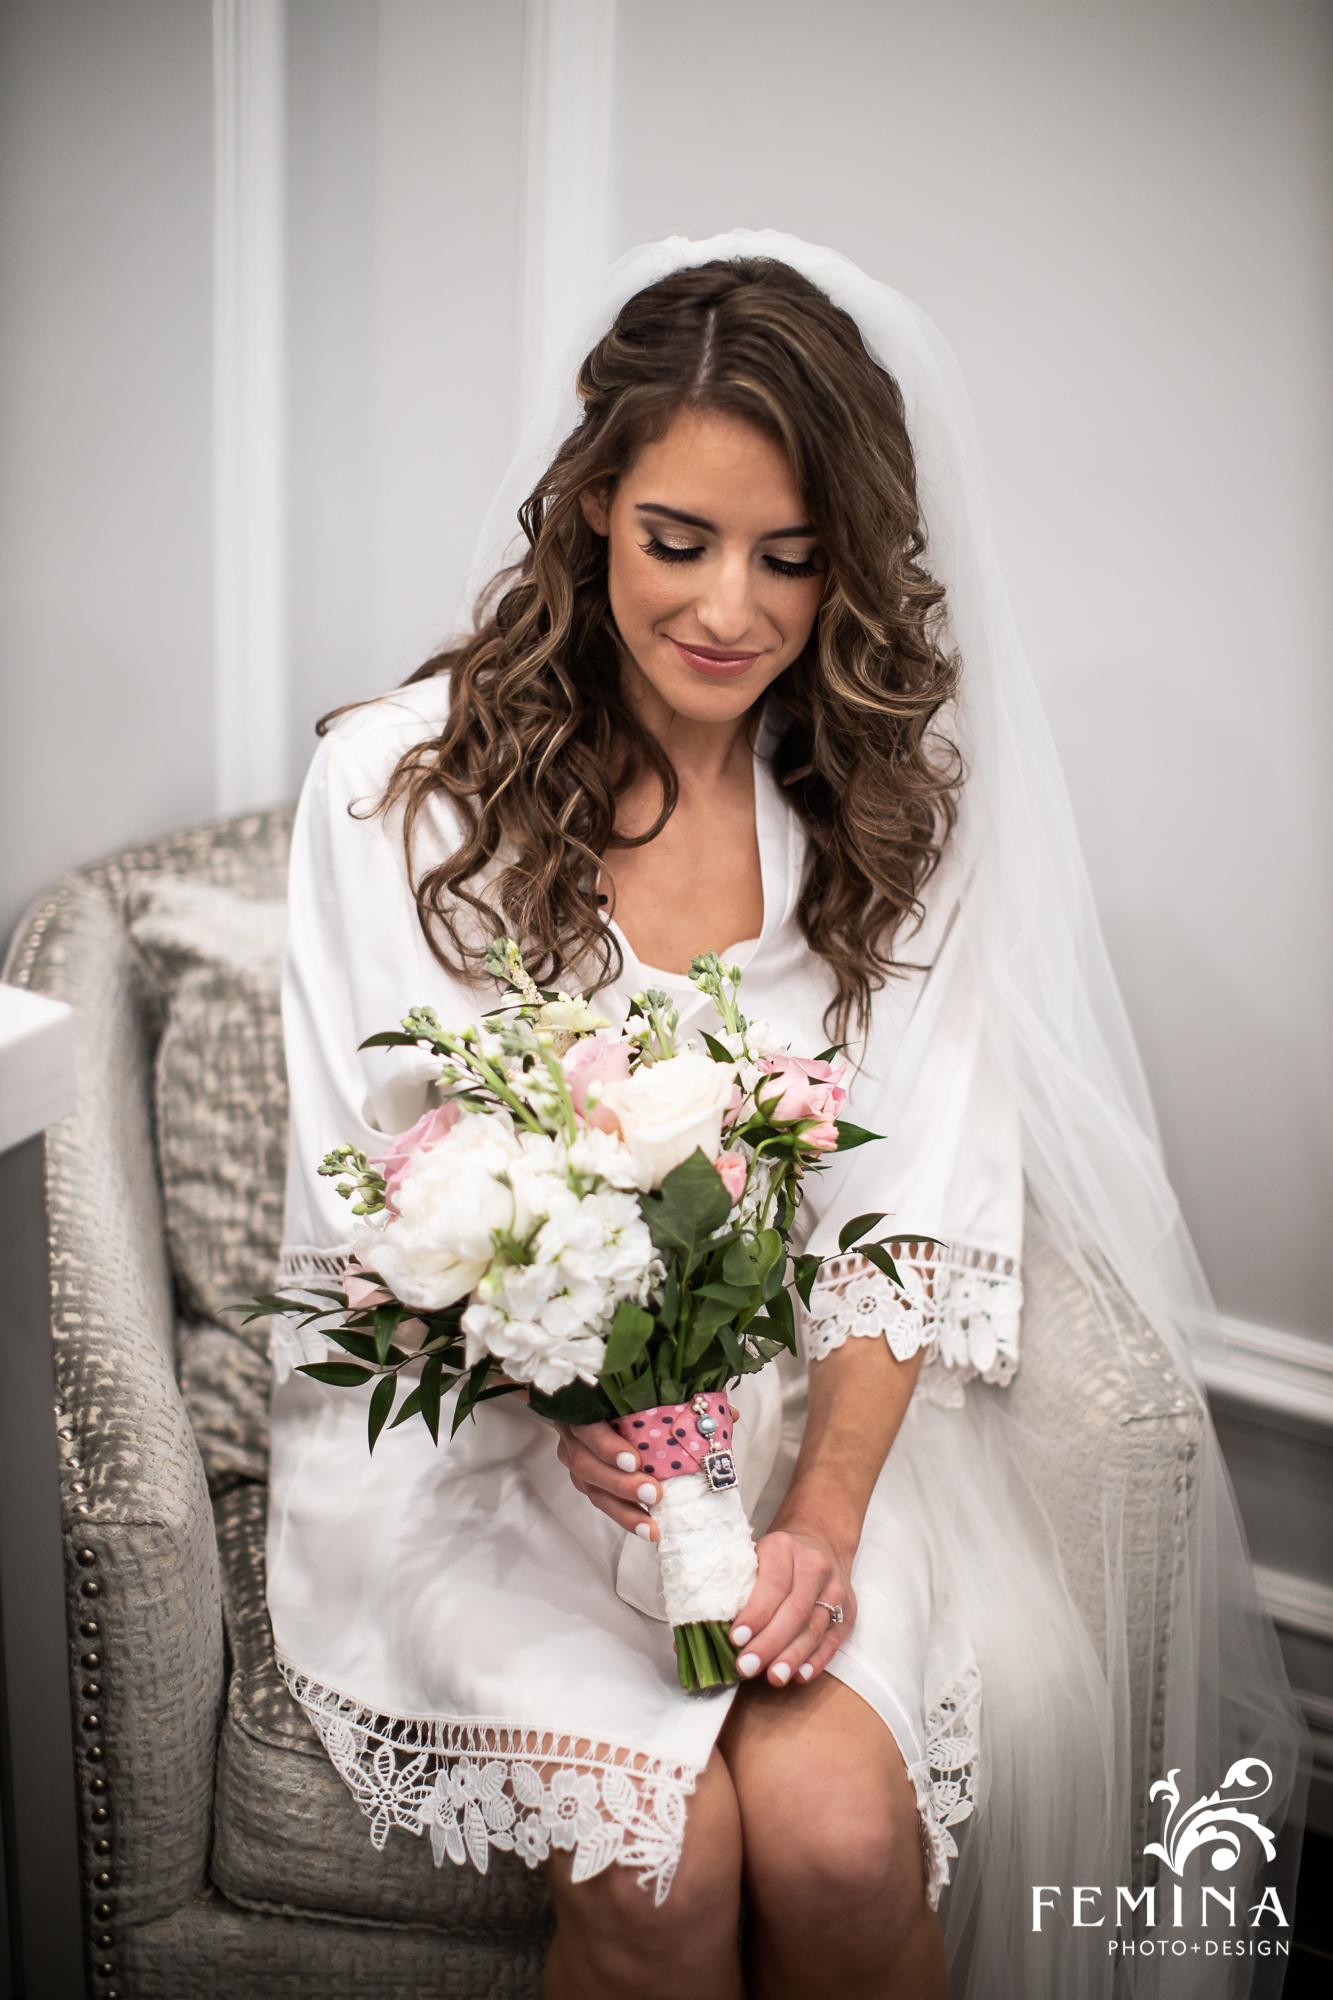 Bride Jamie admiring her bridal bouquet